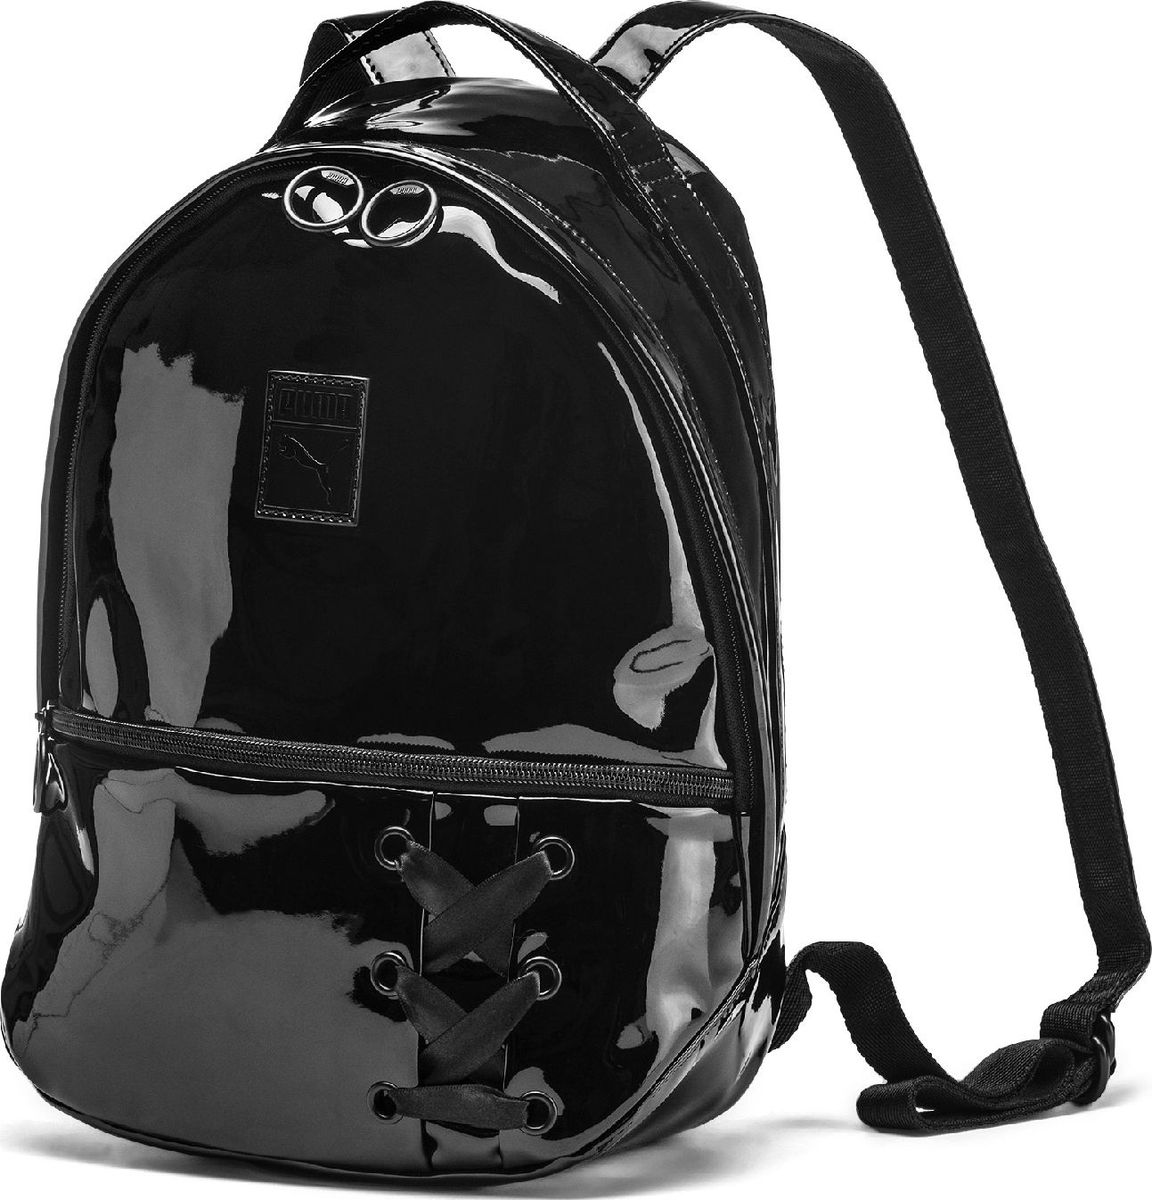 Рюкзак Puma Prime Archive Backpack Crush, 07580701, черный рюкзак adidas harden backpack dw4716 черный